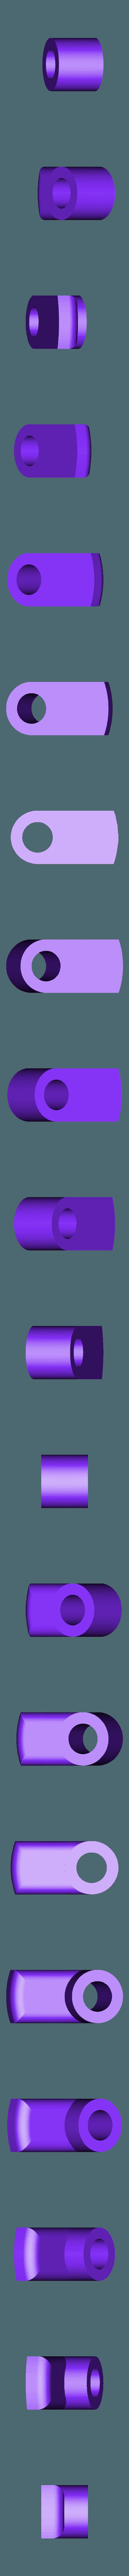 latch.stl Download free STL file Castle door • 3D printing template, MakeItWork